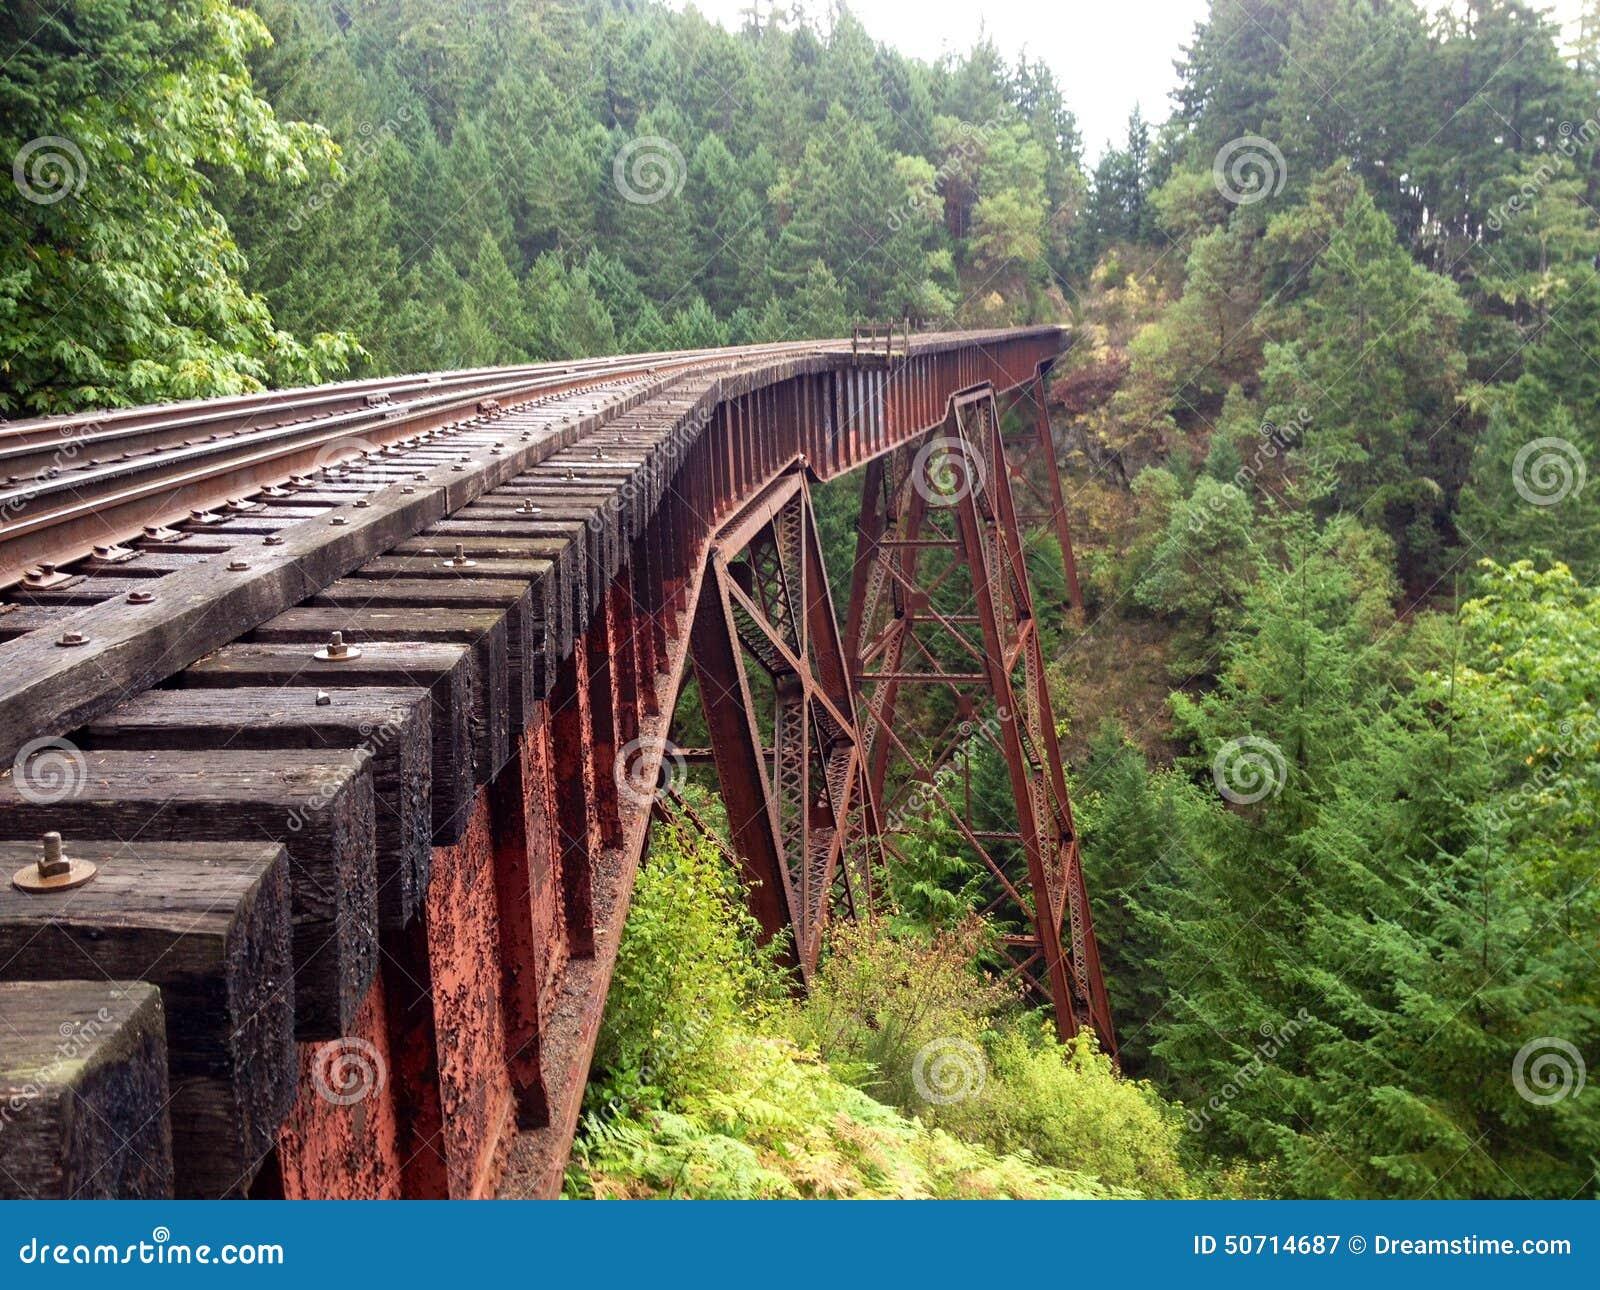 Train Track Or Train Bridge Or Trestle In The Forest Stock Photo ...